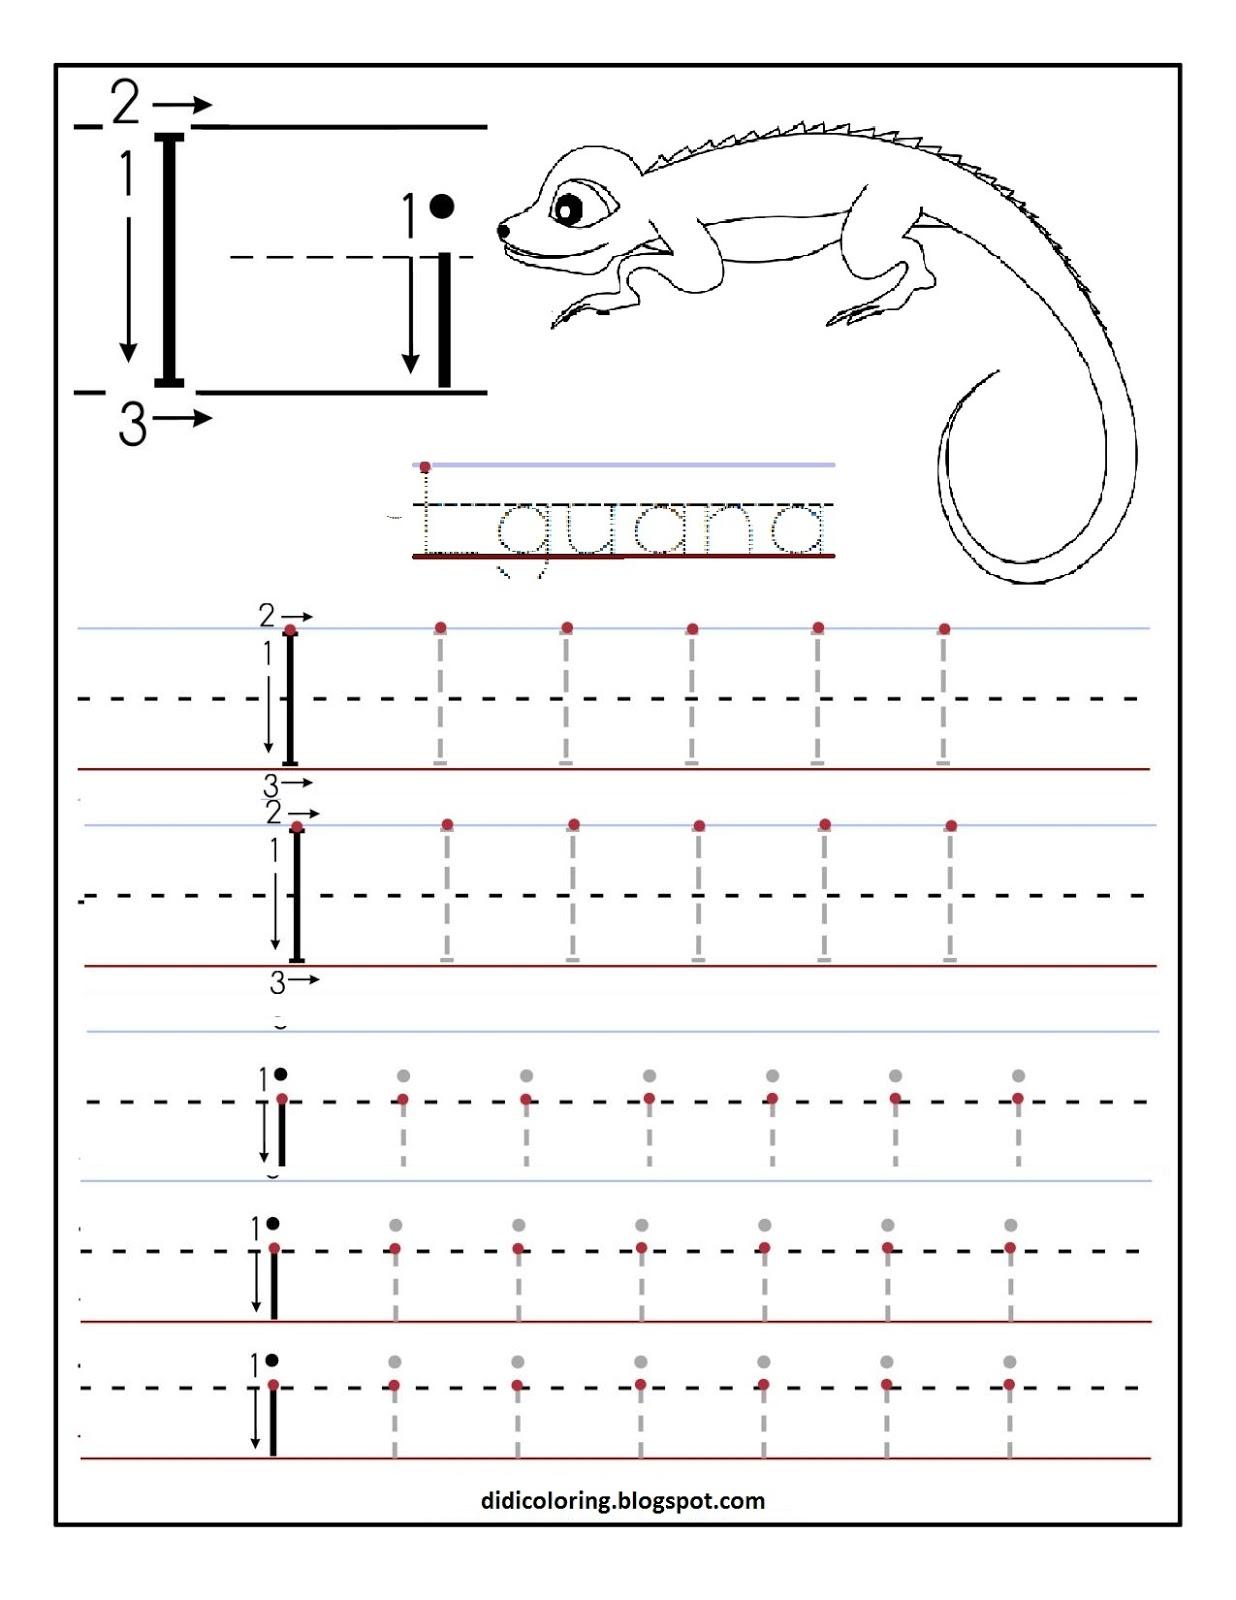 Free Printable Worksheet For Kidsst For Your Child To